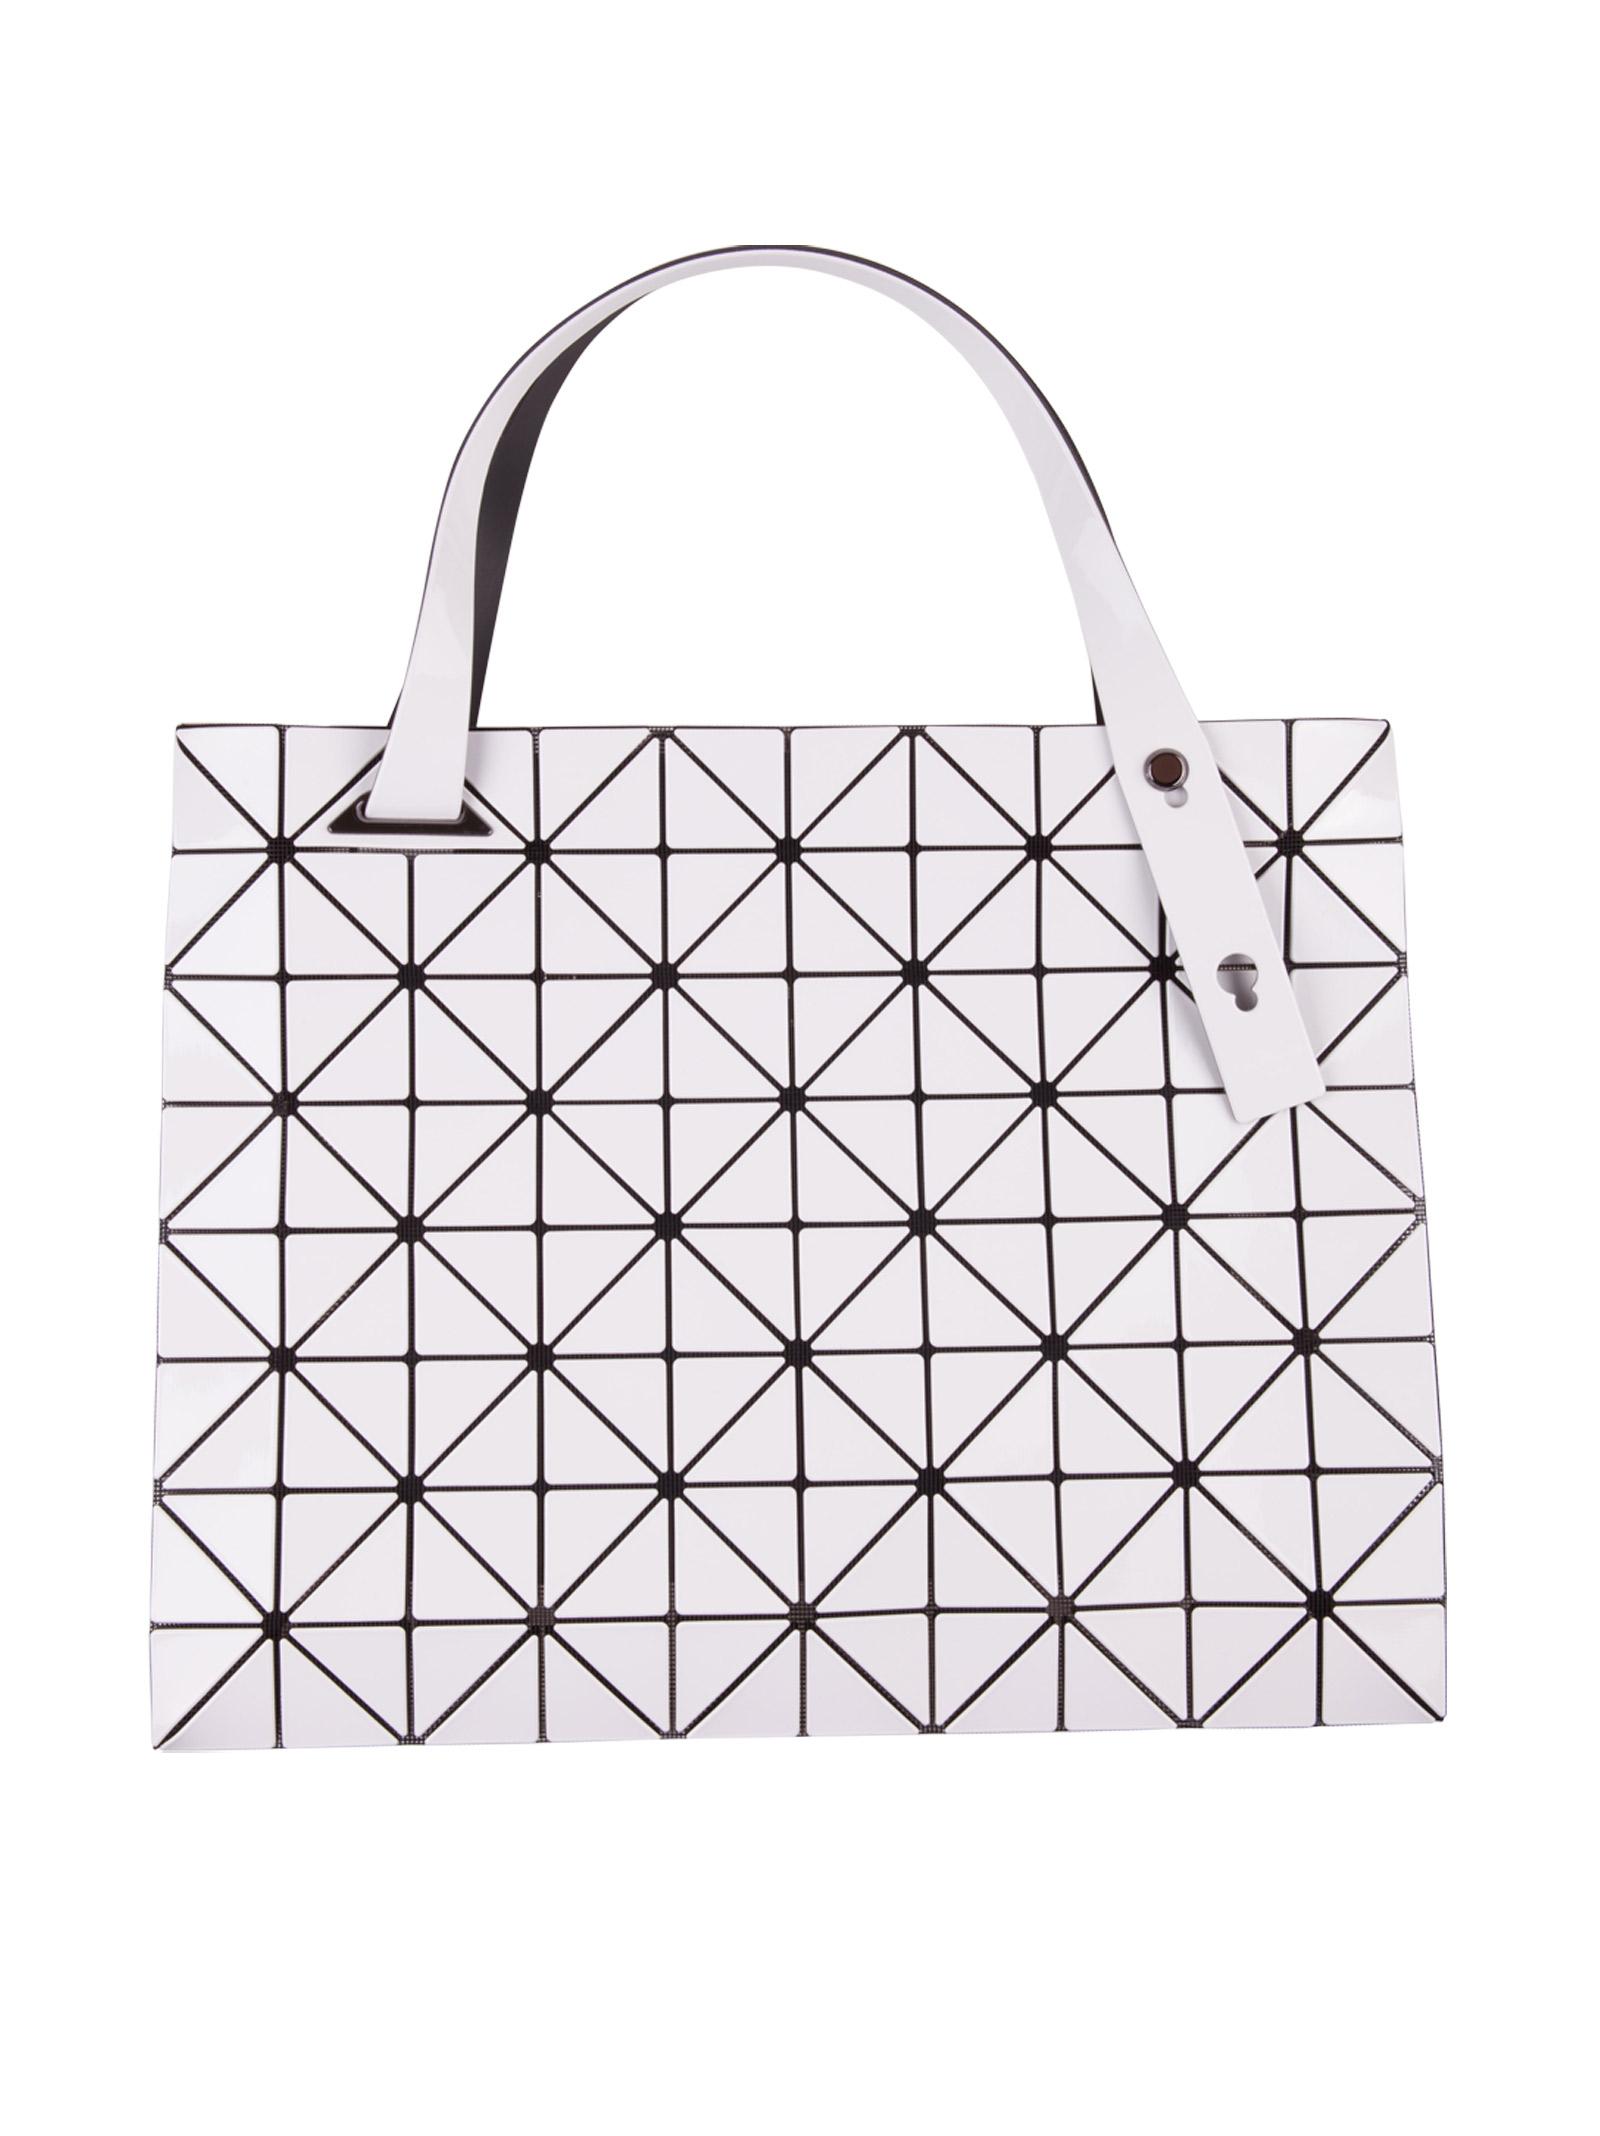 Issey Miyake tote bag - Issey Miyake - Michele Franzese Moda 7f825e6cb106c